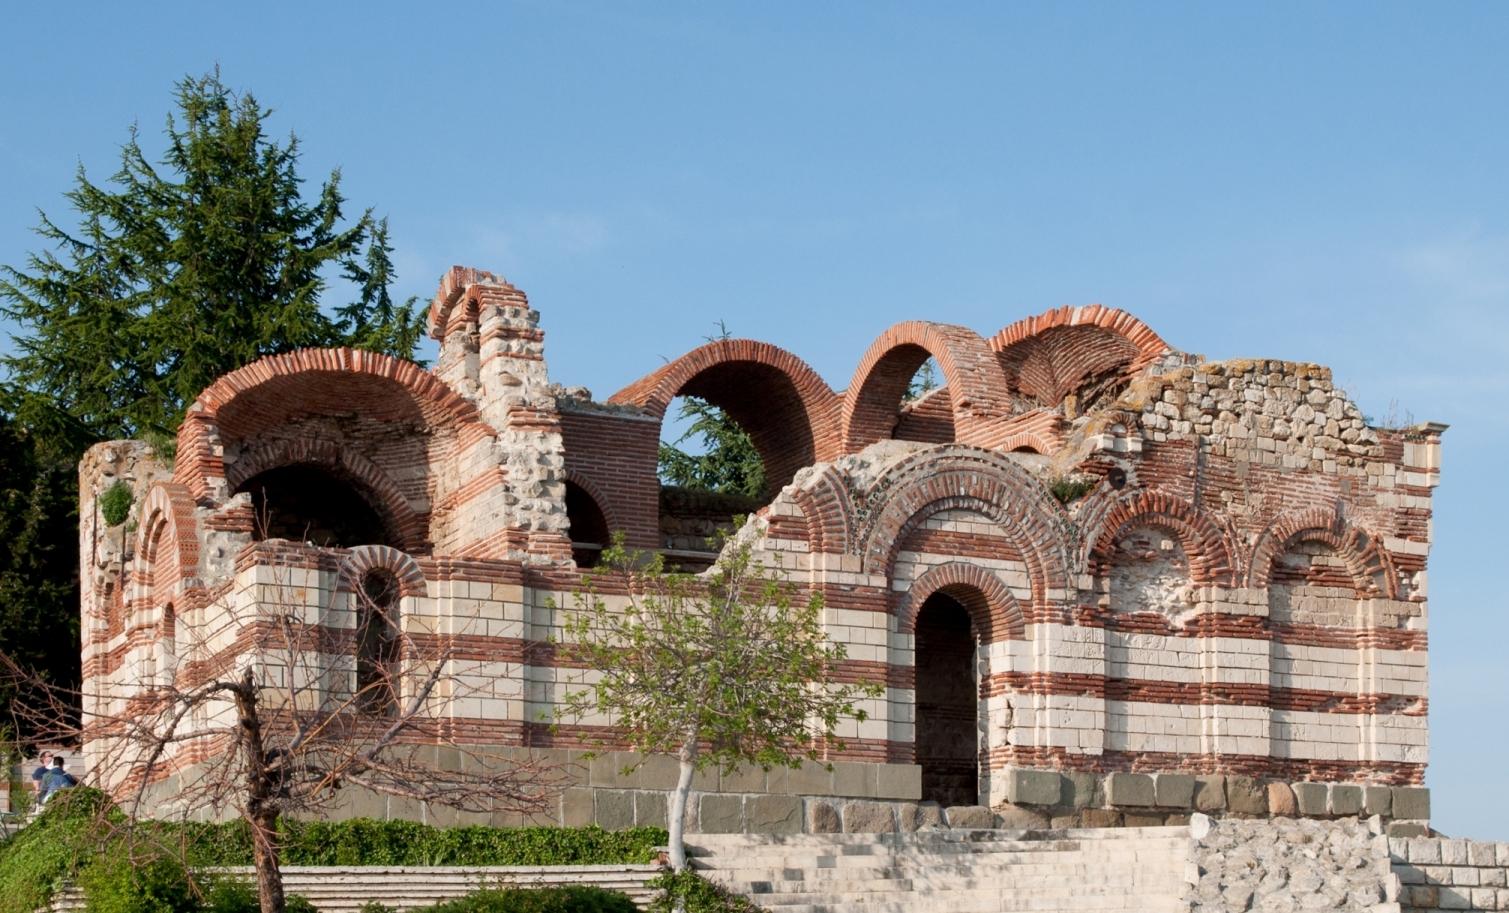 The Church of St. John Aliturgetos